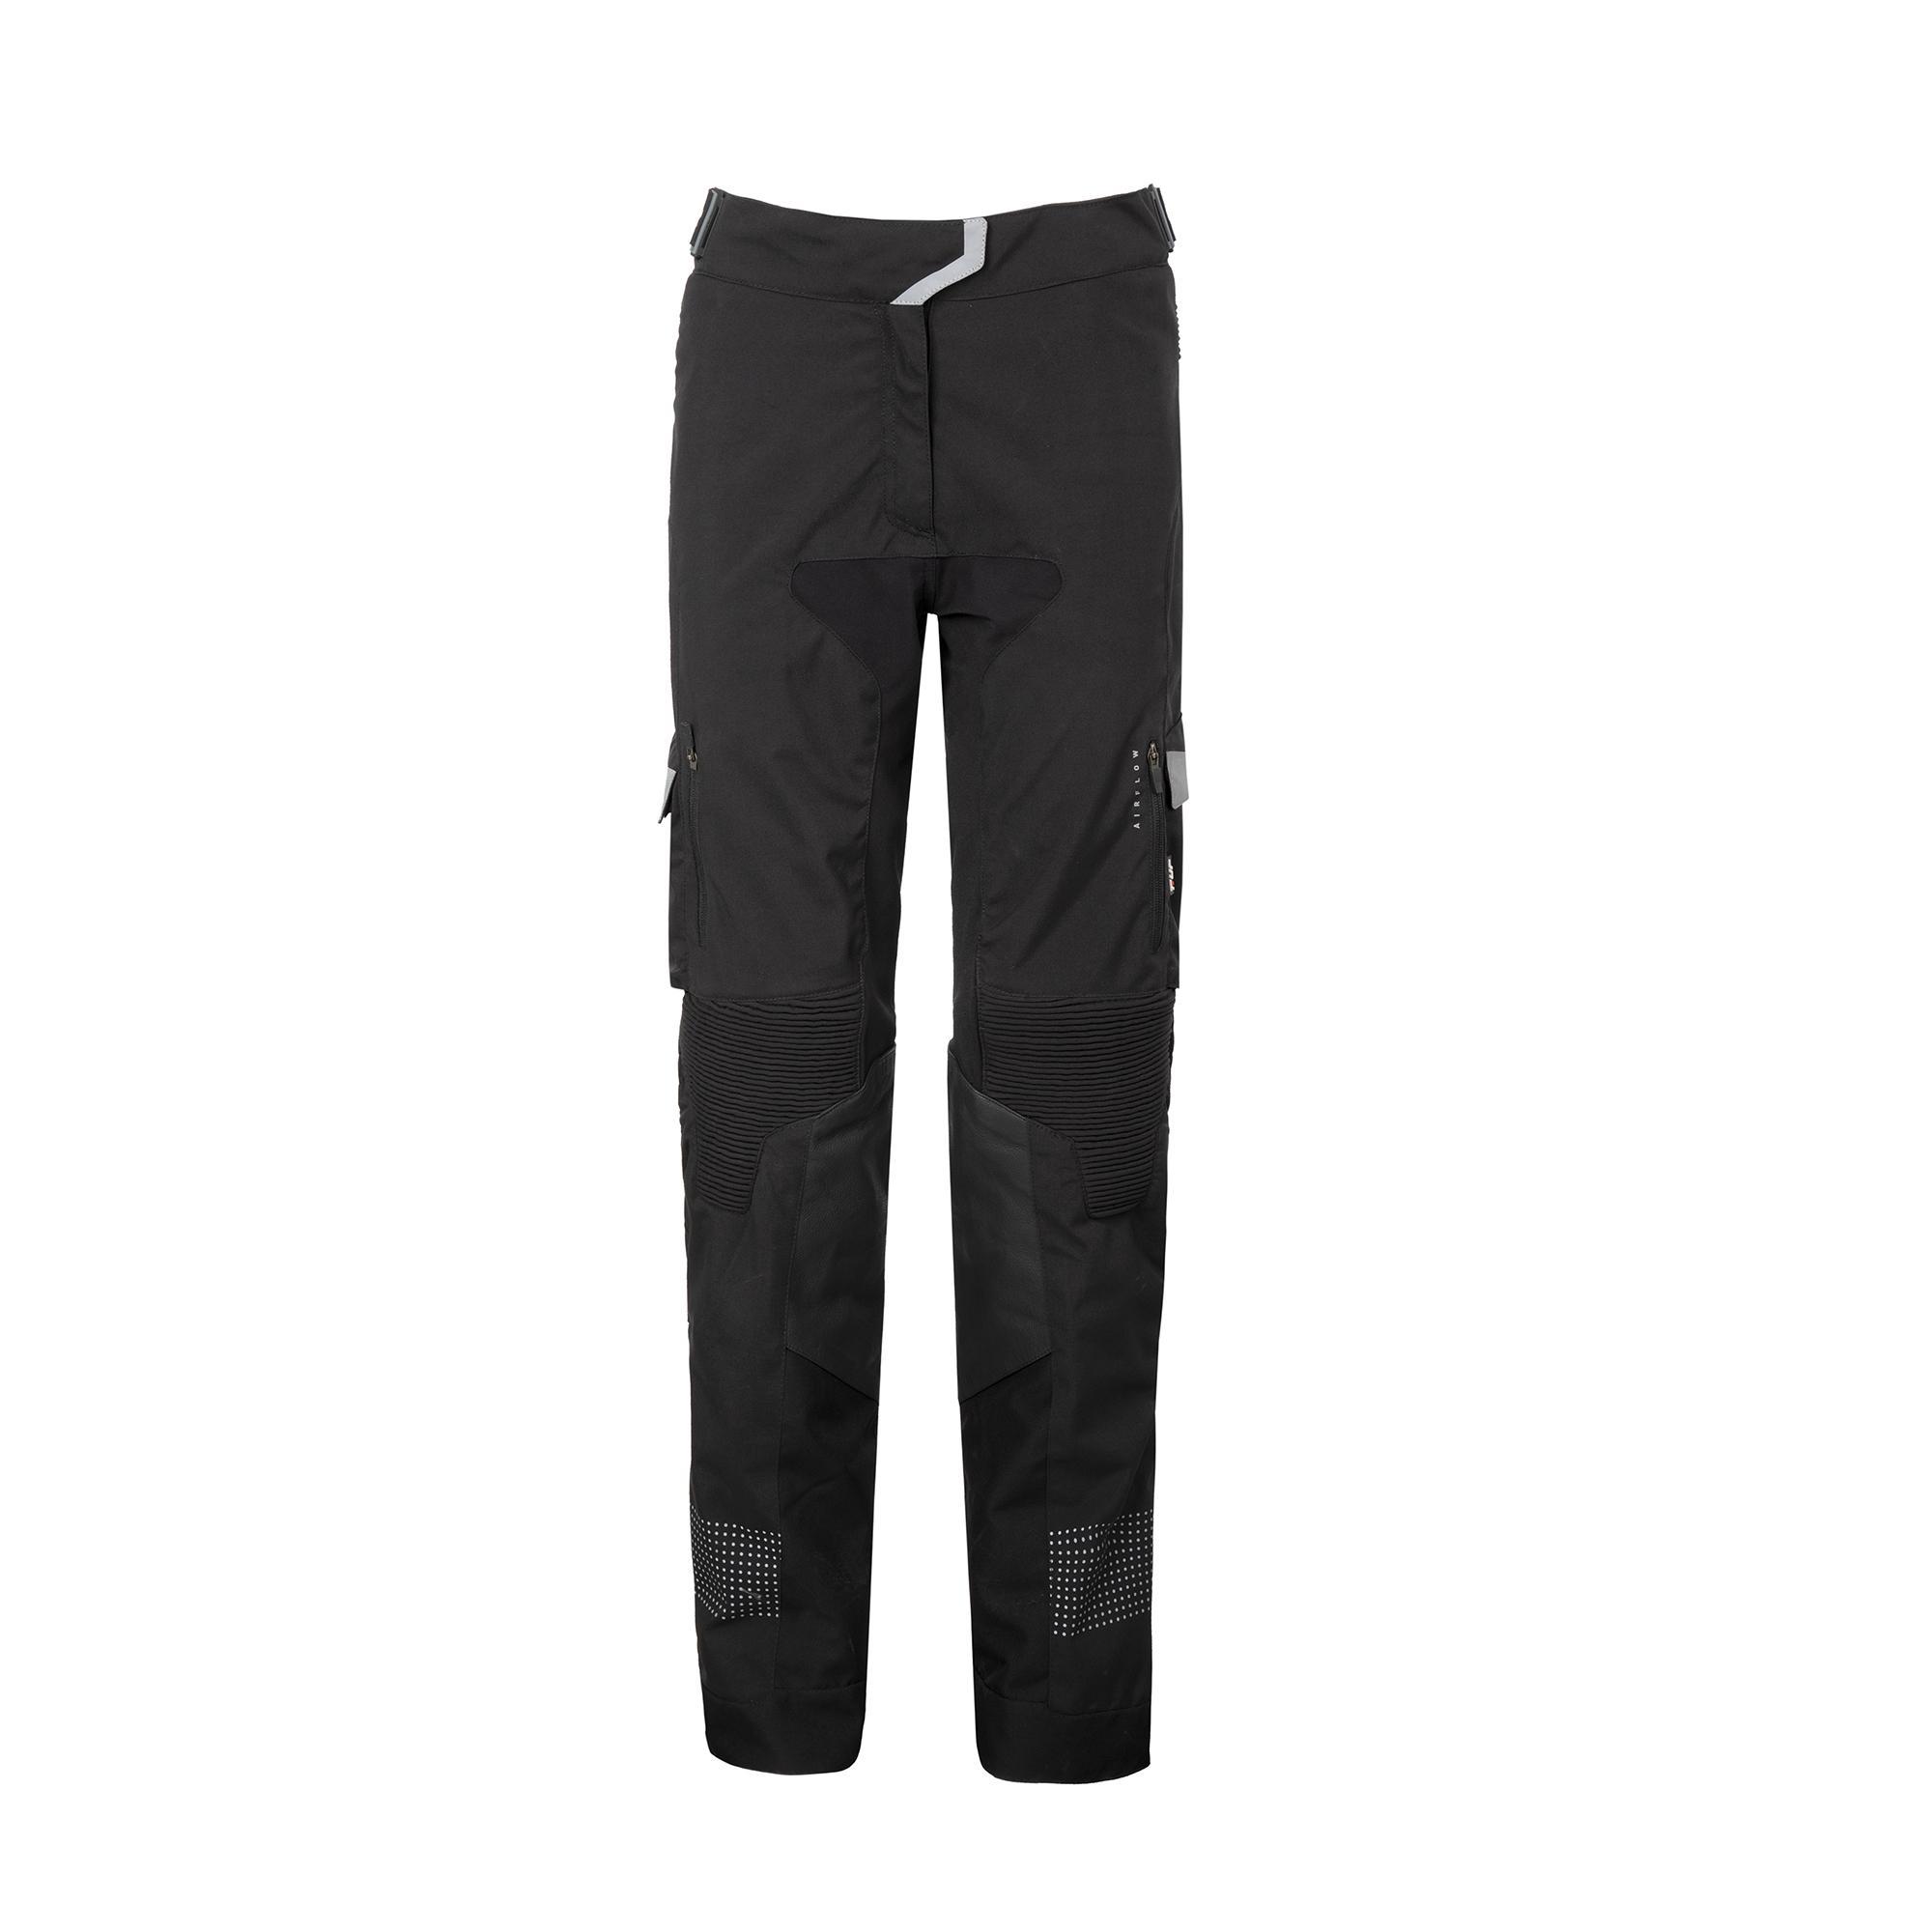 Pantalone P-one Lady Black